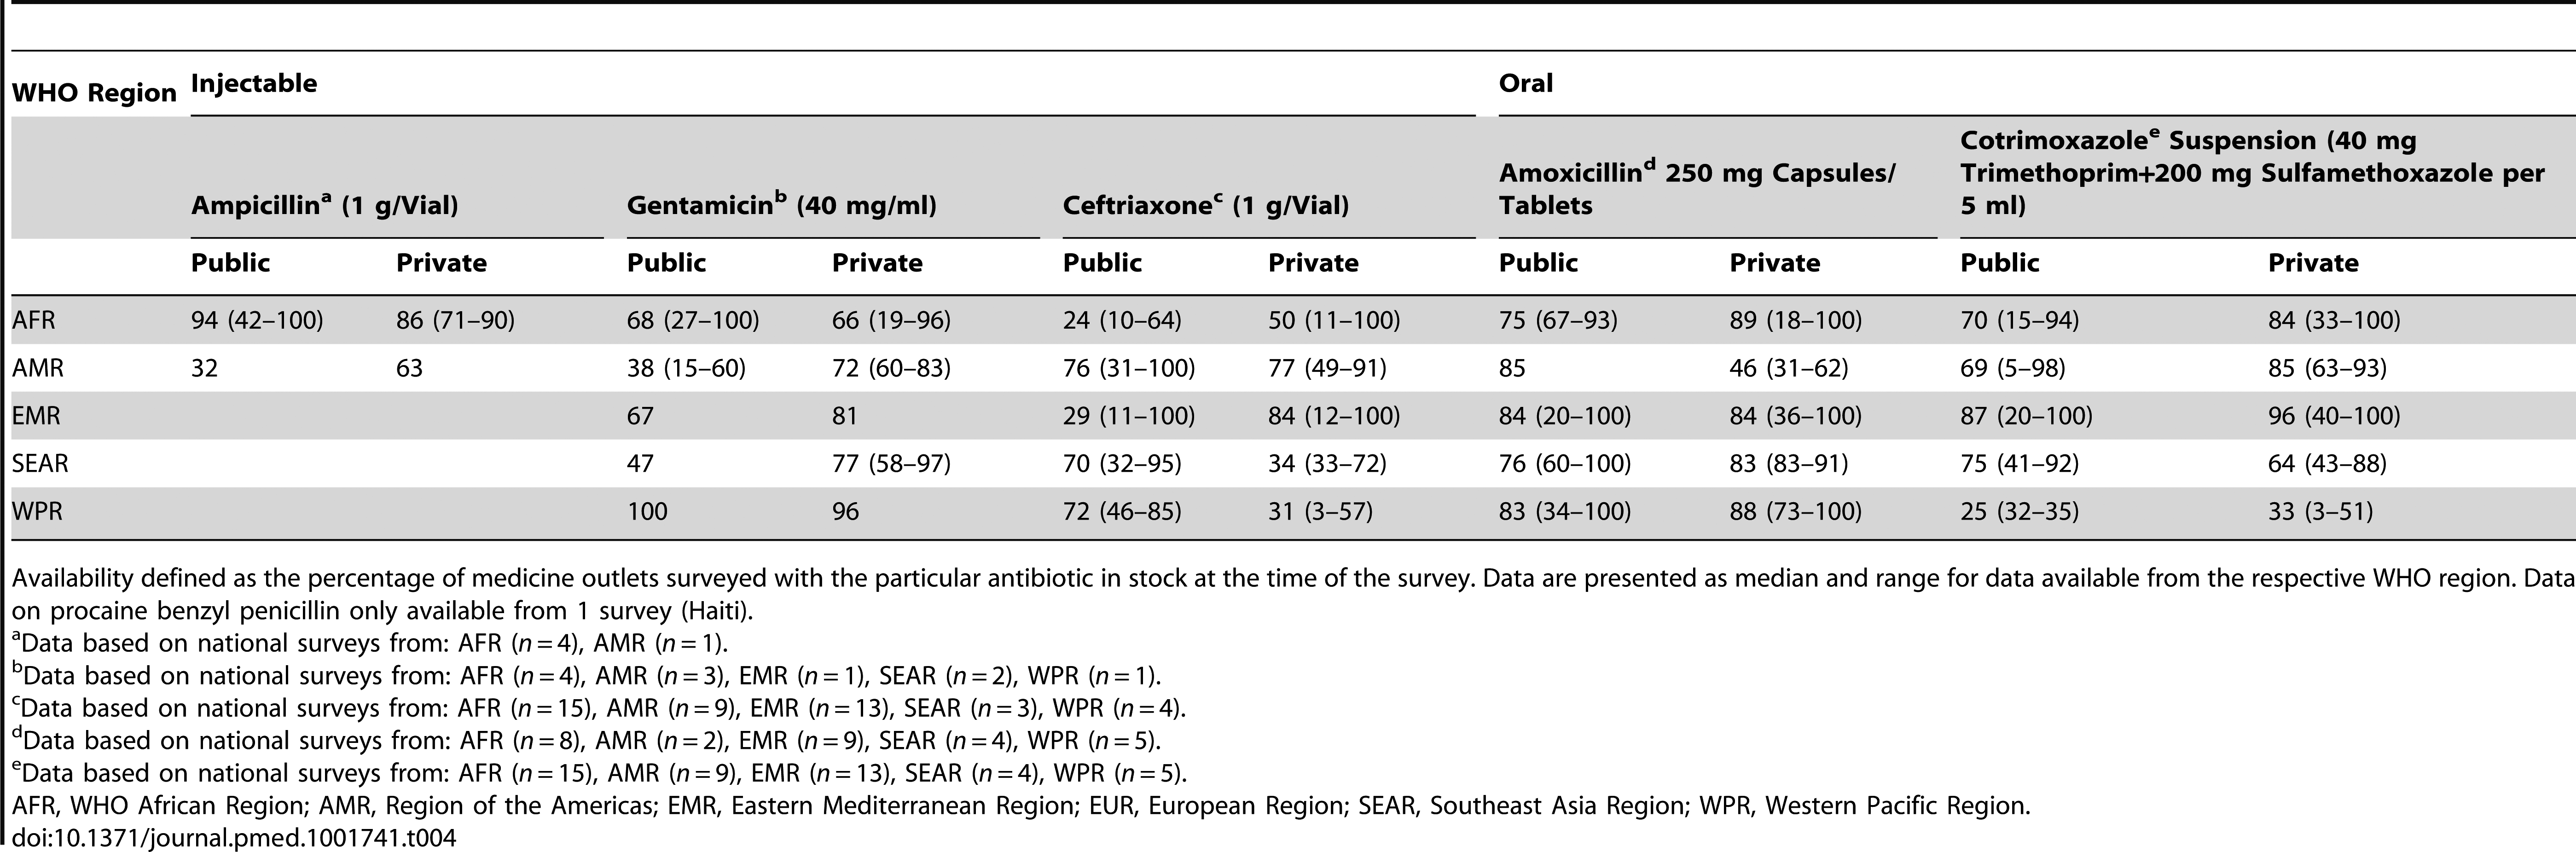 WHO/HAI data on antibiotic availability by WHO region.